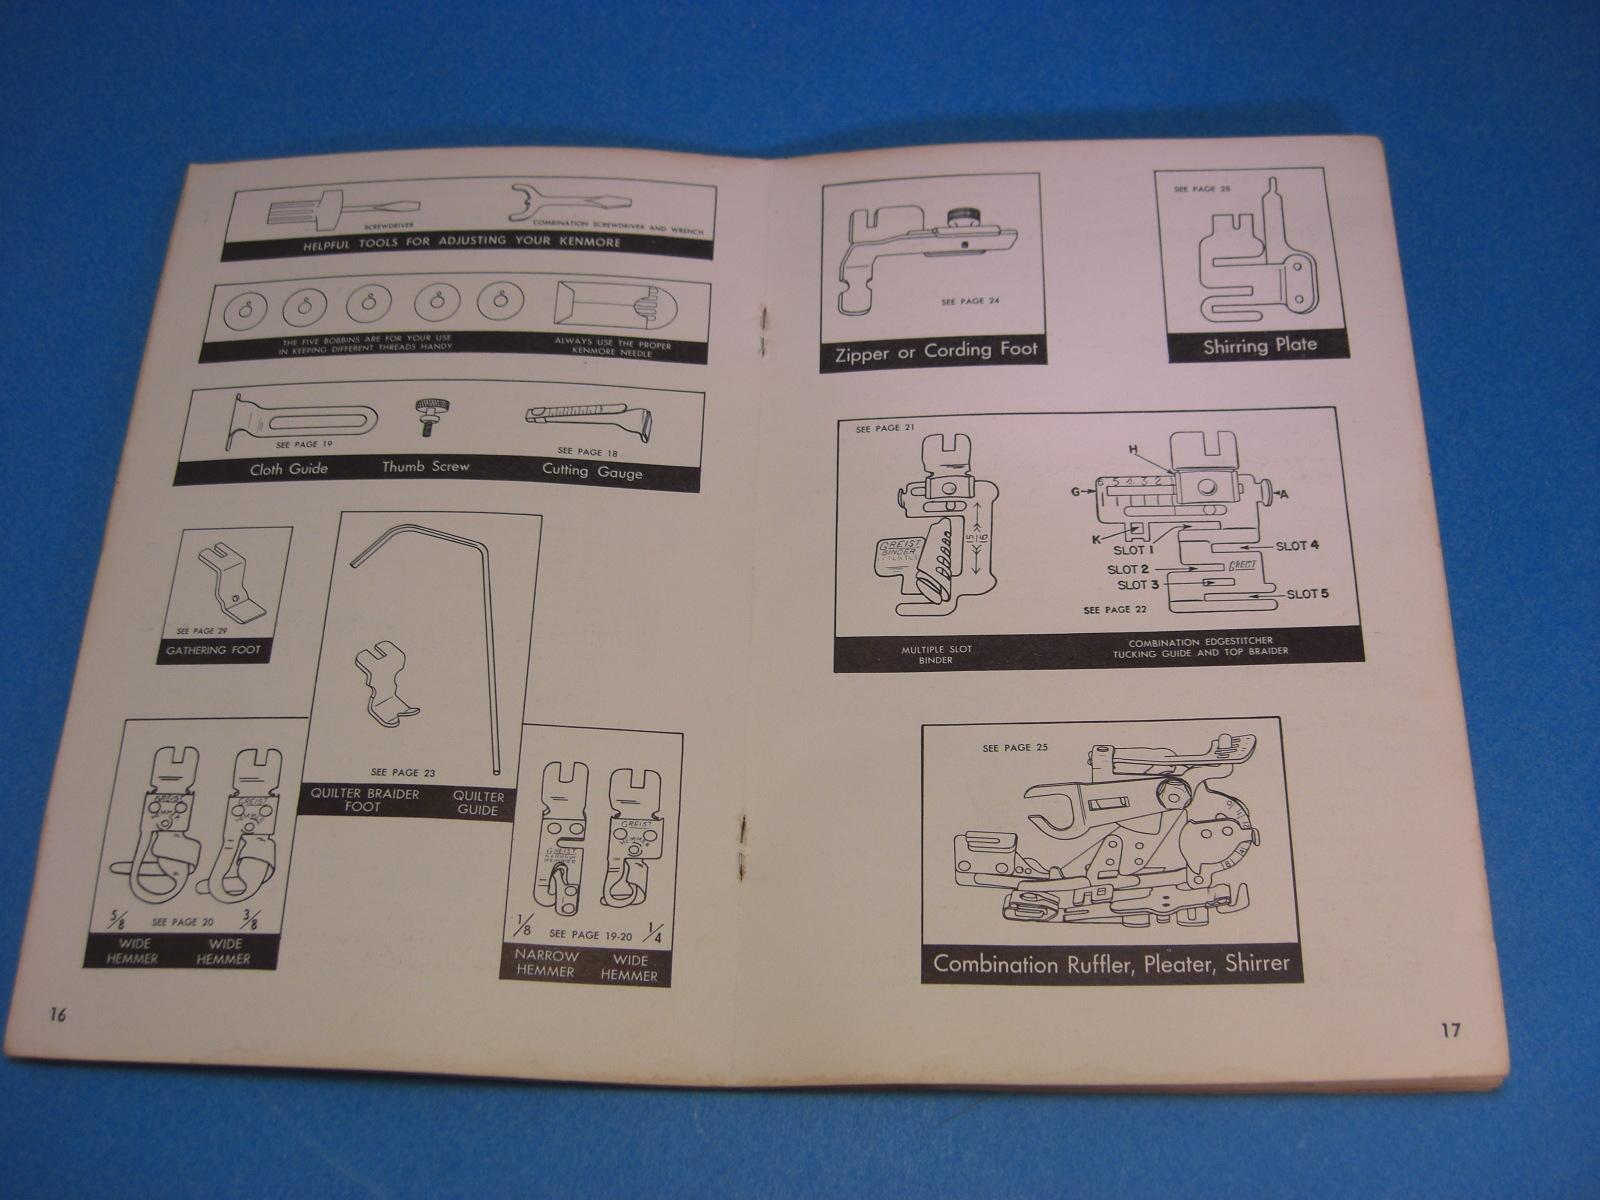 sear kenmore sewing machine manual